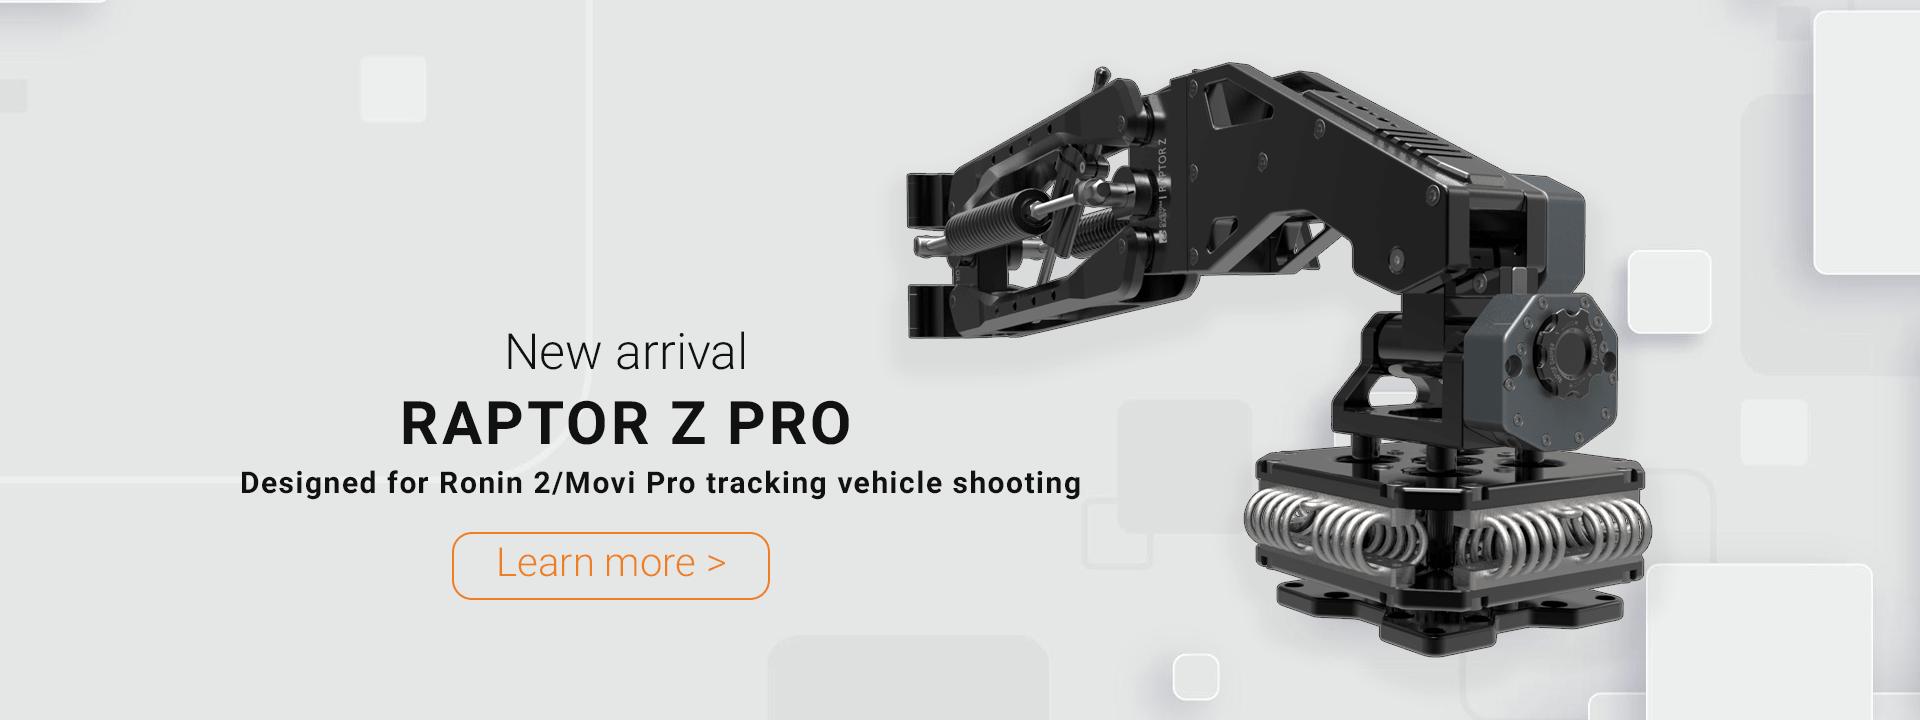 Raptor Z Pro designed for DJI Ronin 2 or Freefly Movi Pro tracking vehicle shooting